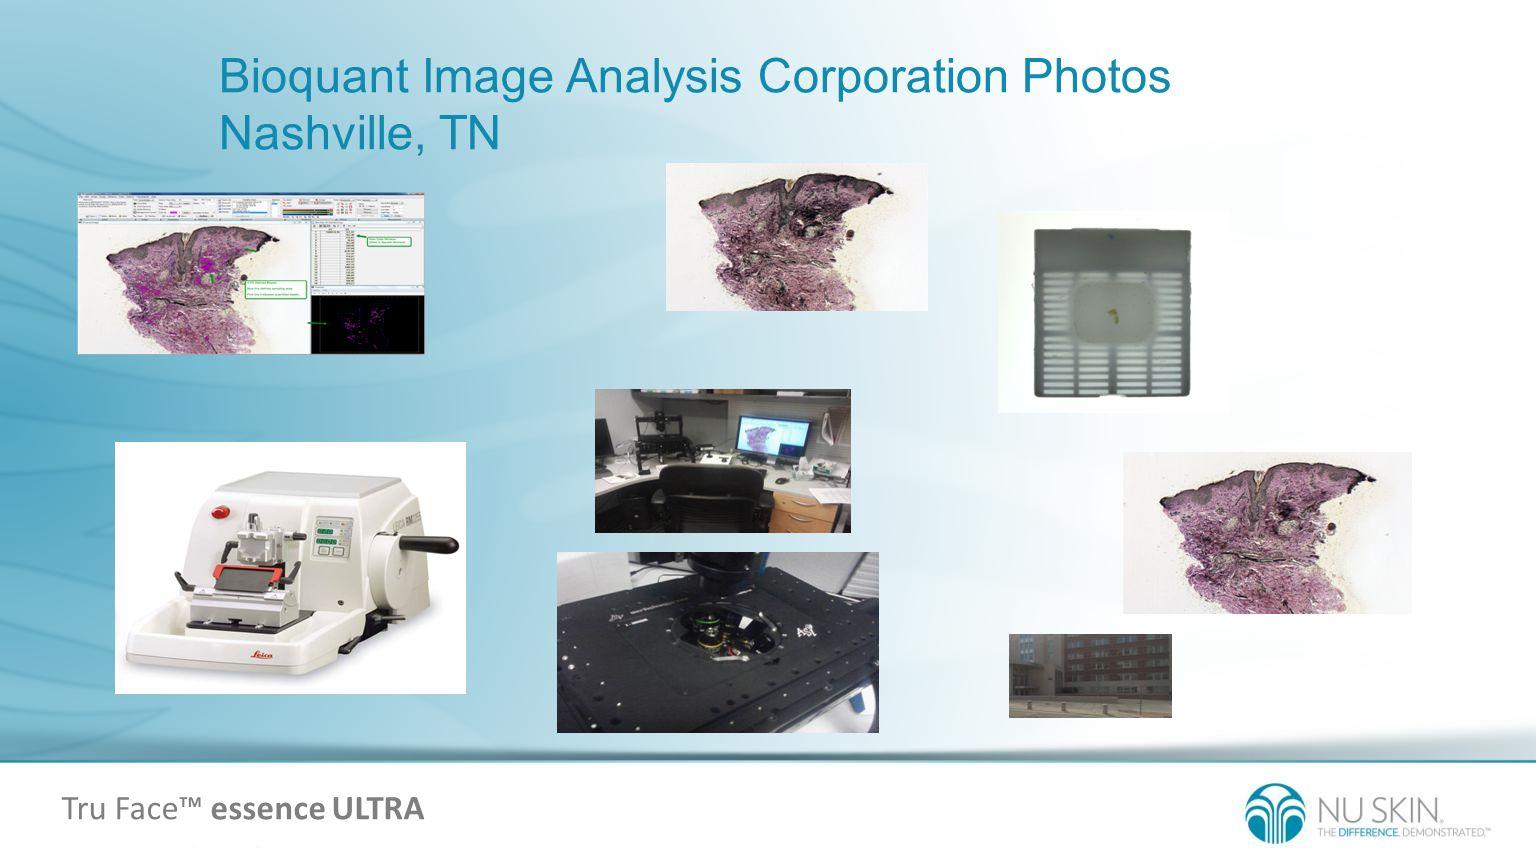 Bioquant Image Analysis Corporation Photos Nashville, TN Tru Face essence ULTRA